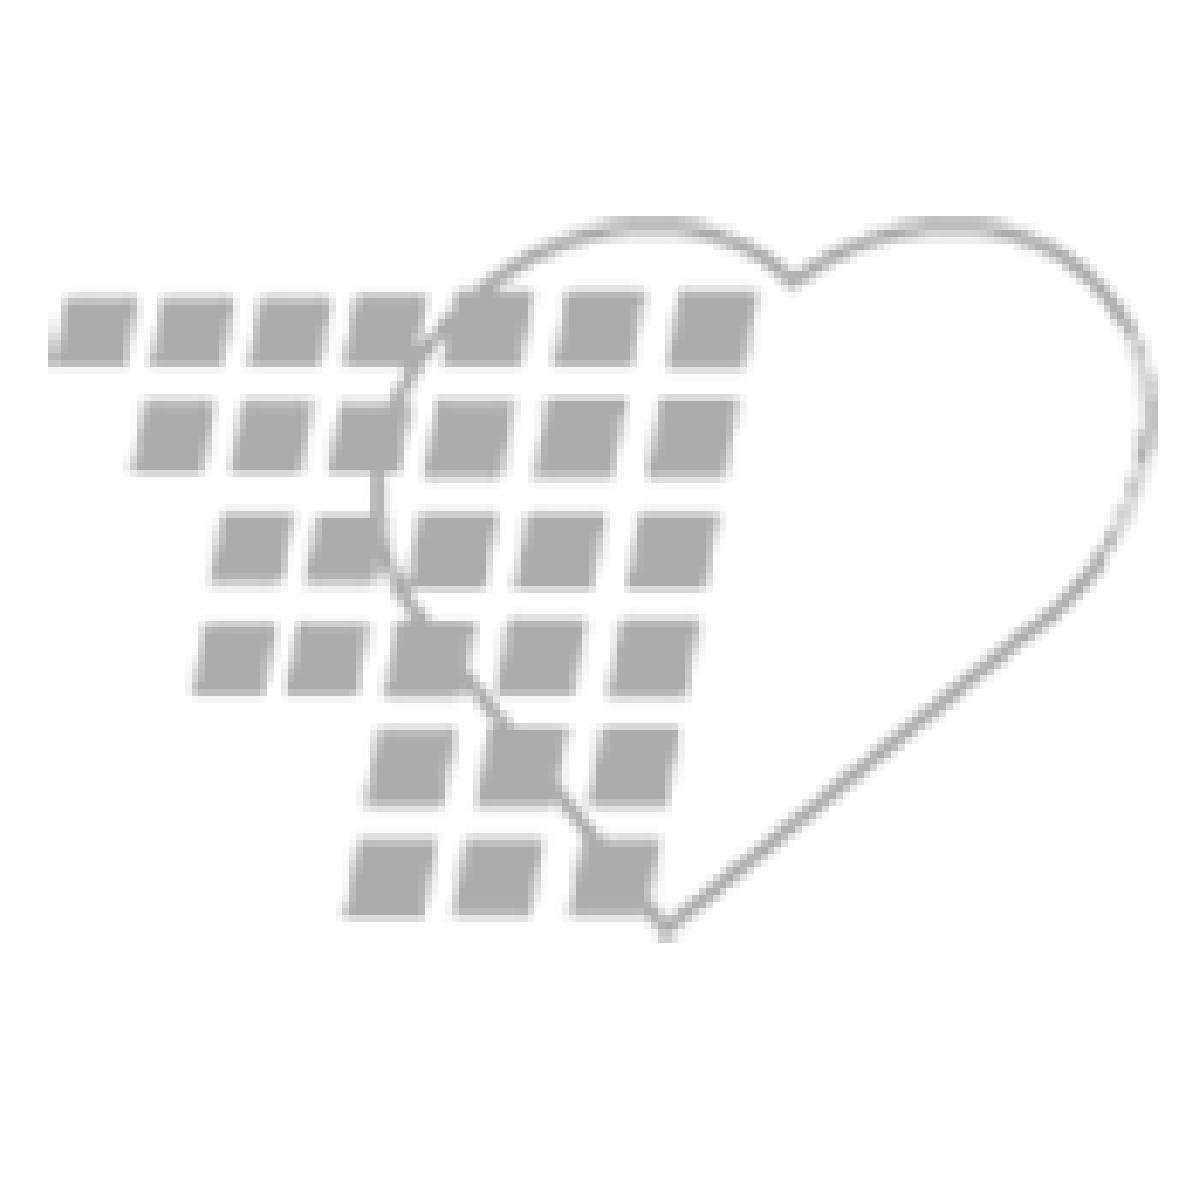 06-21-9600 Saf-T Holder® Devices for Blood Draw